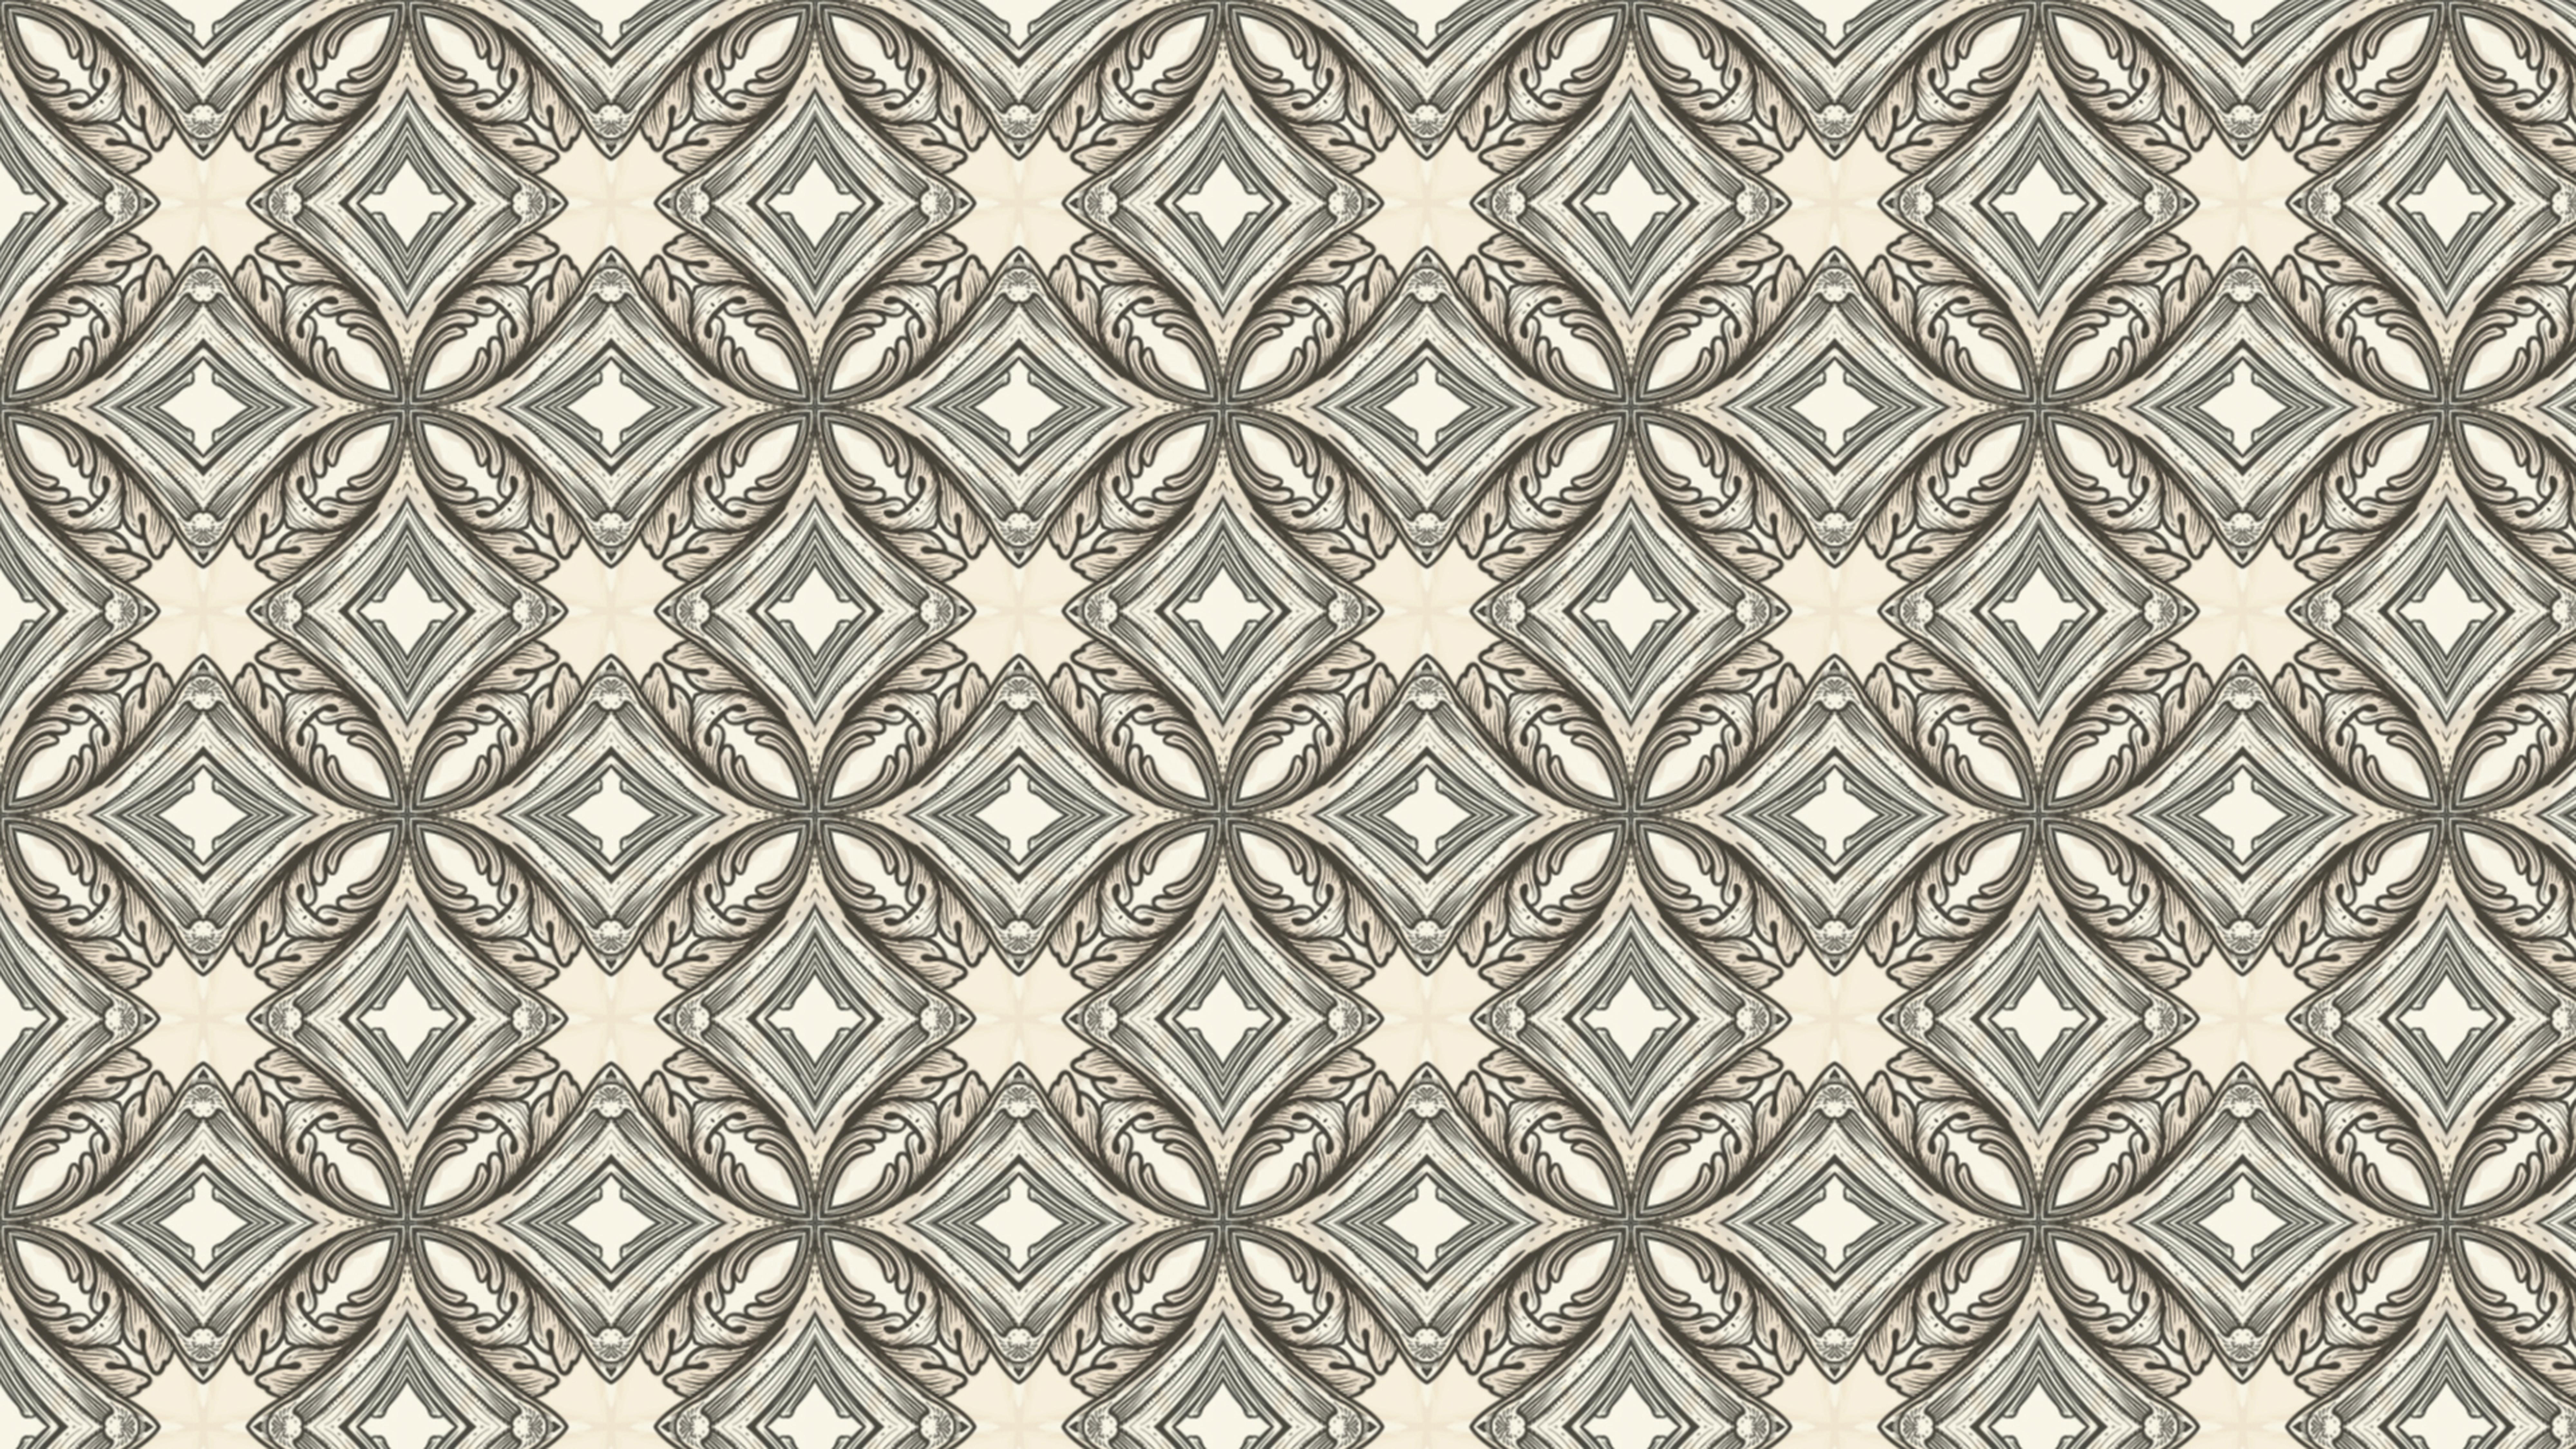 Light Brown Vintage Seamless Floral Background Pattern